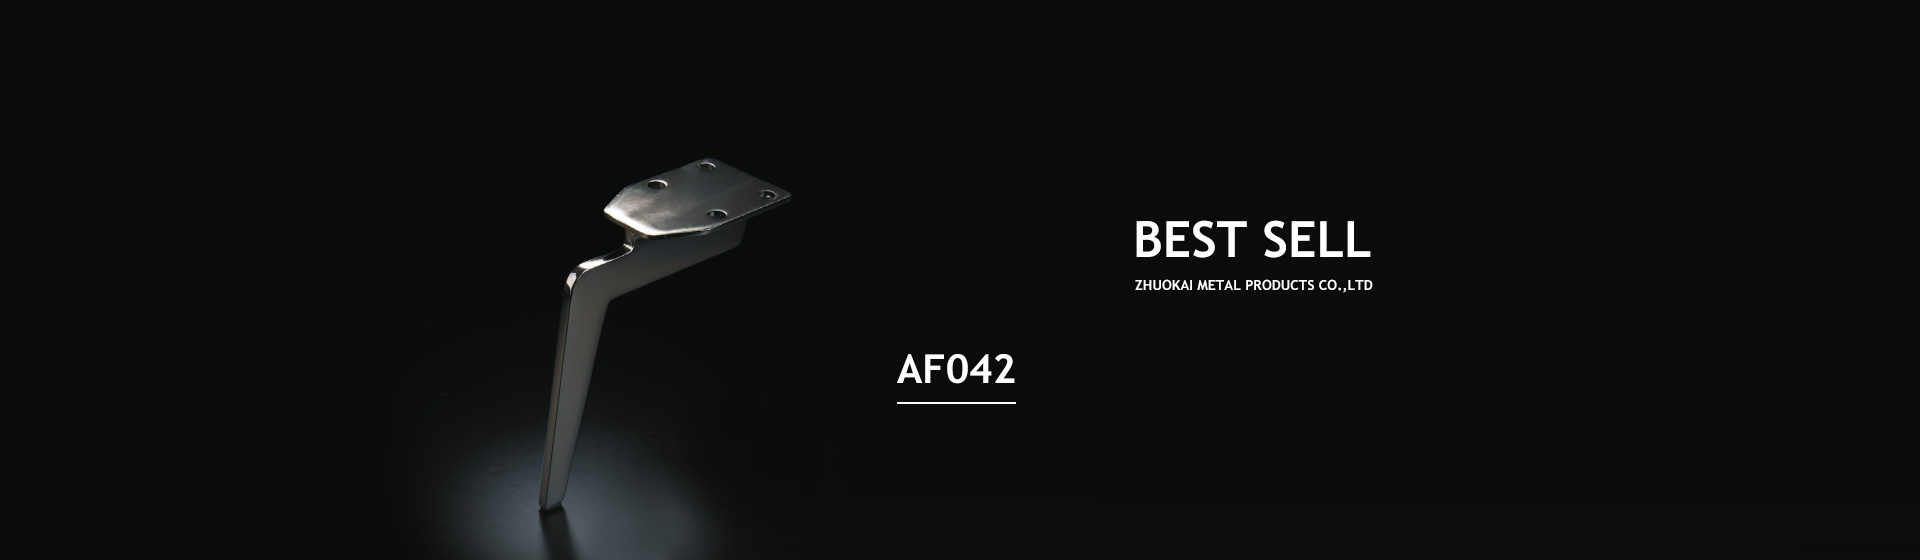 AF042